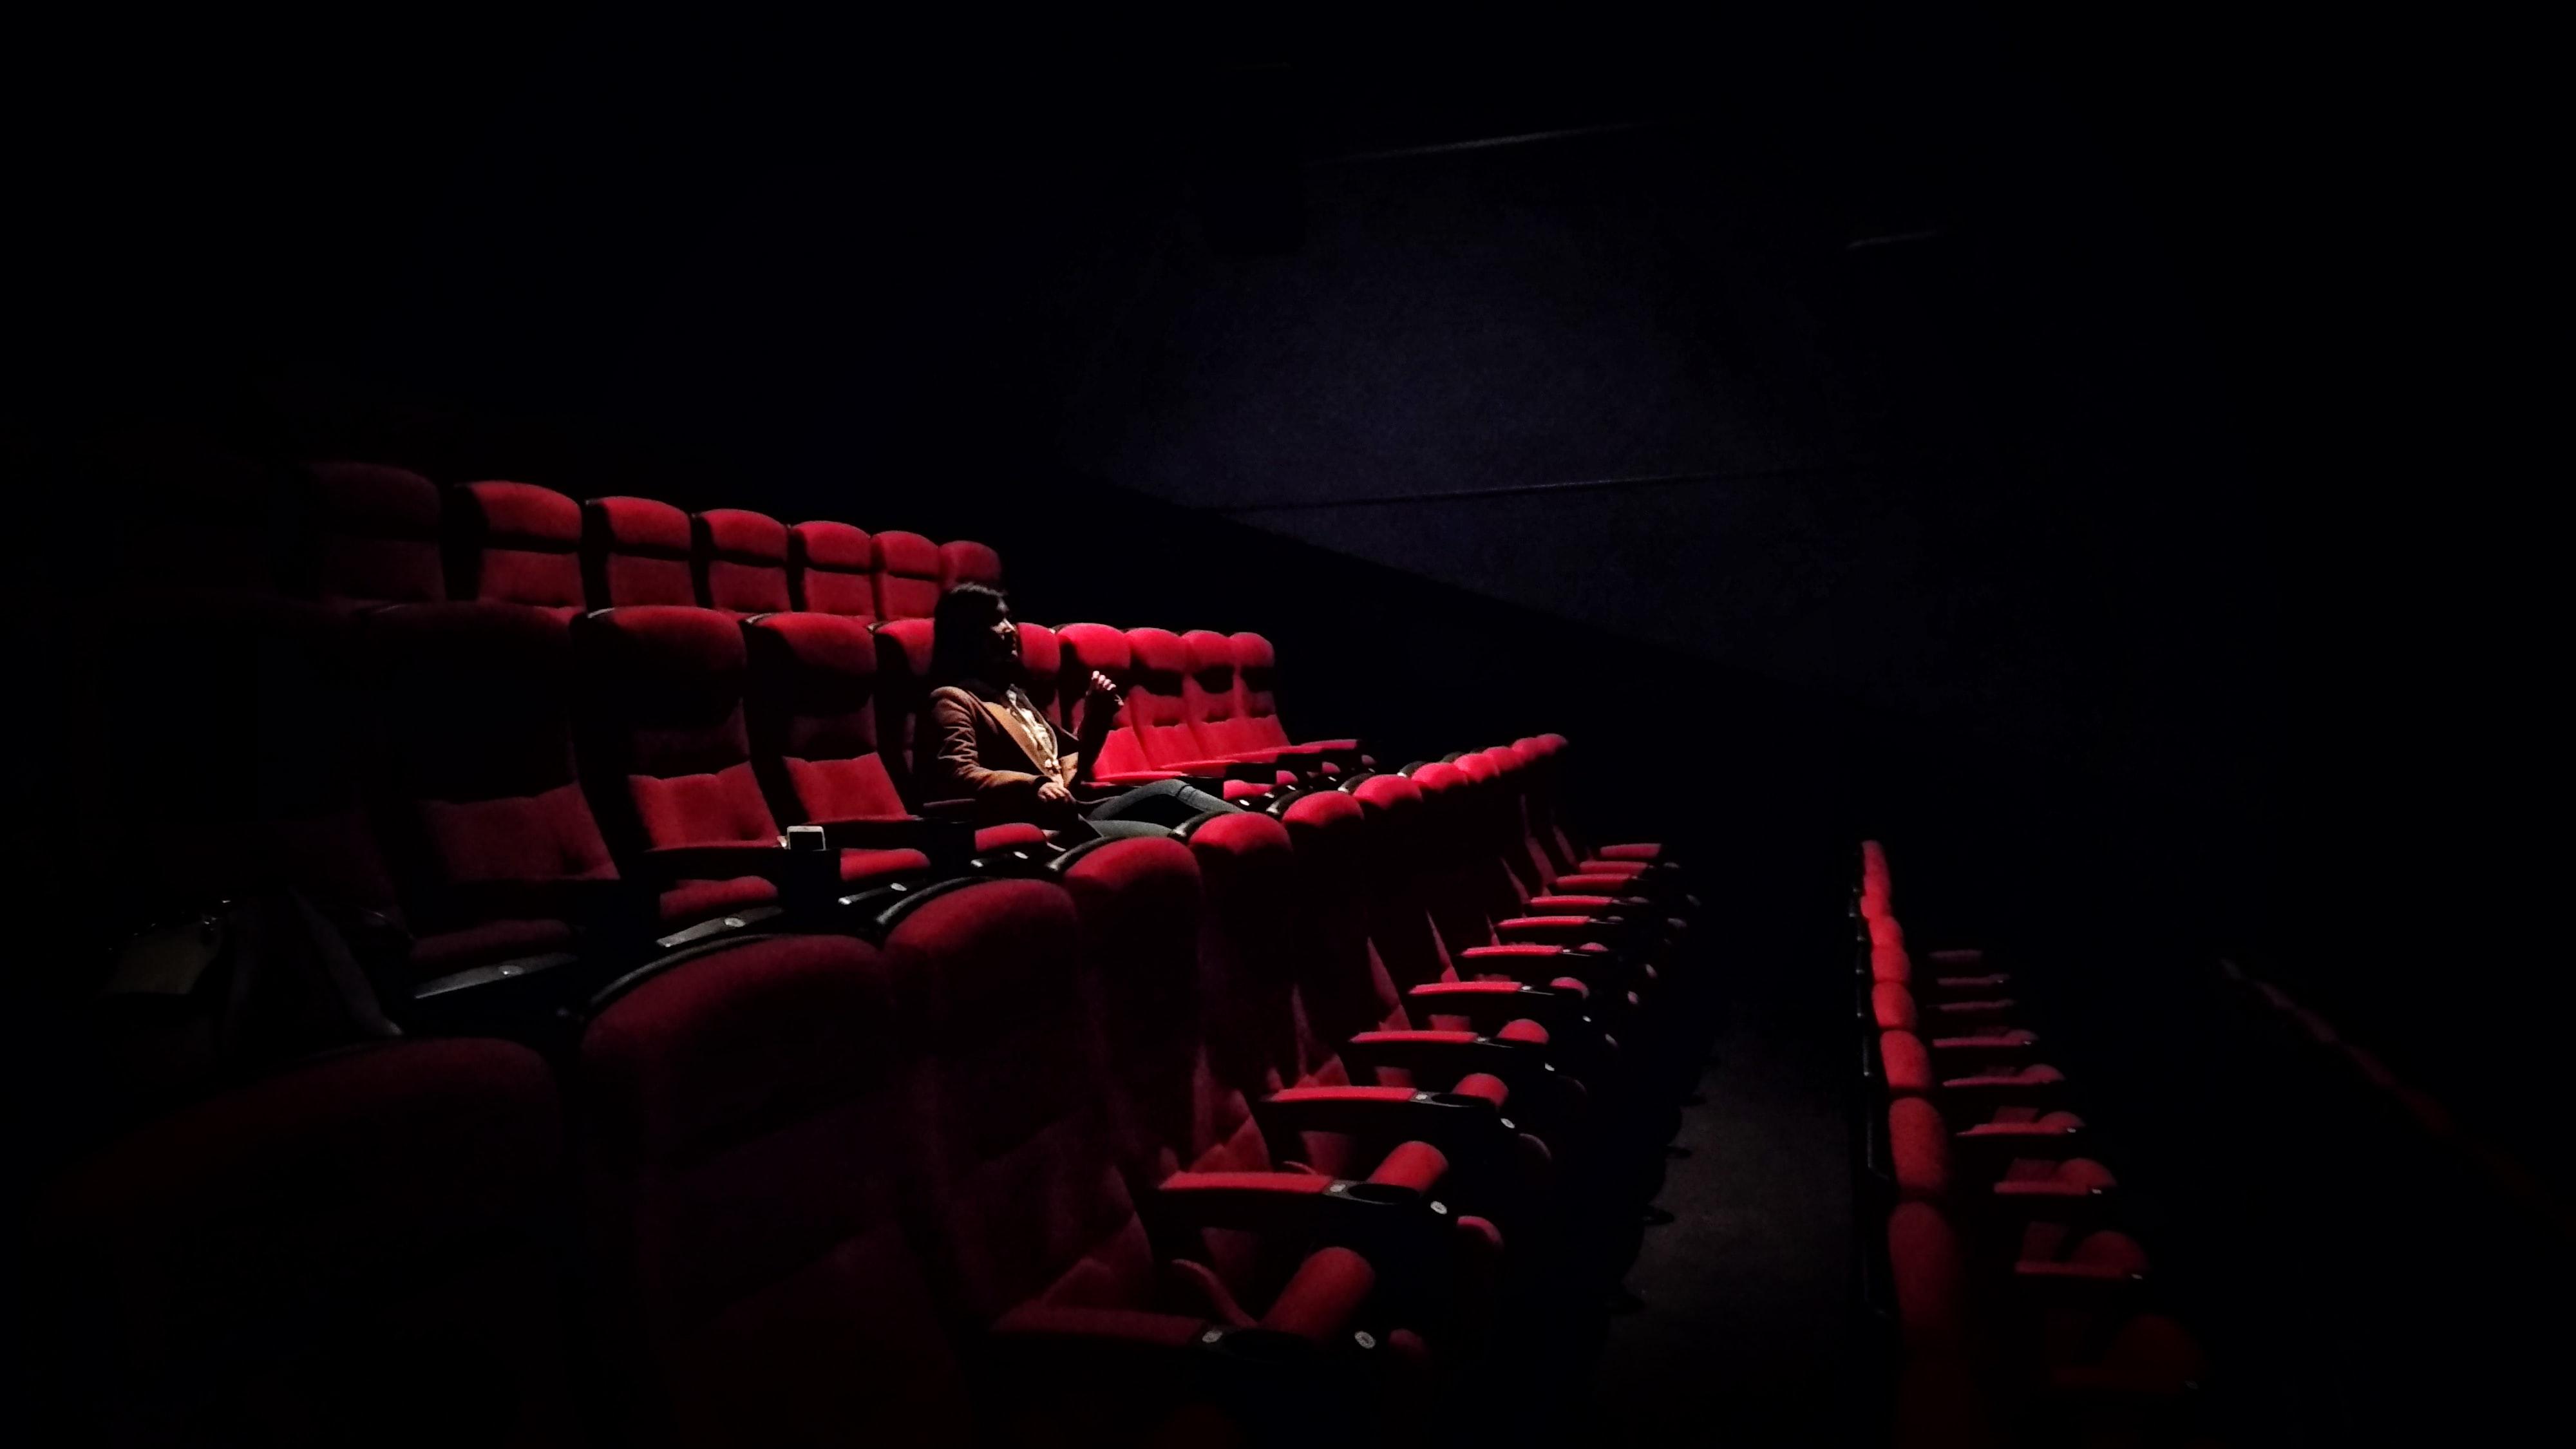 a screen shot of a video game in a dark room